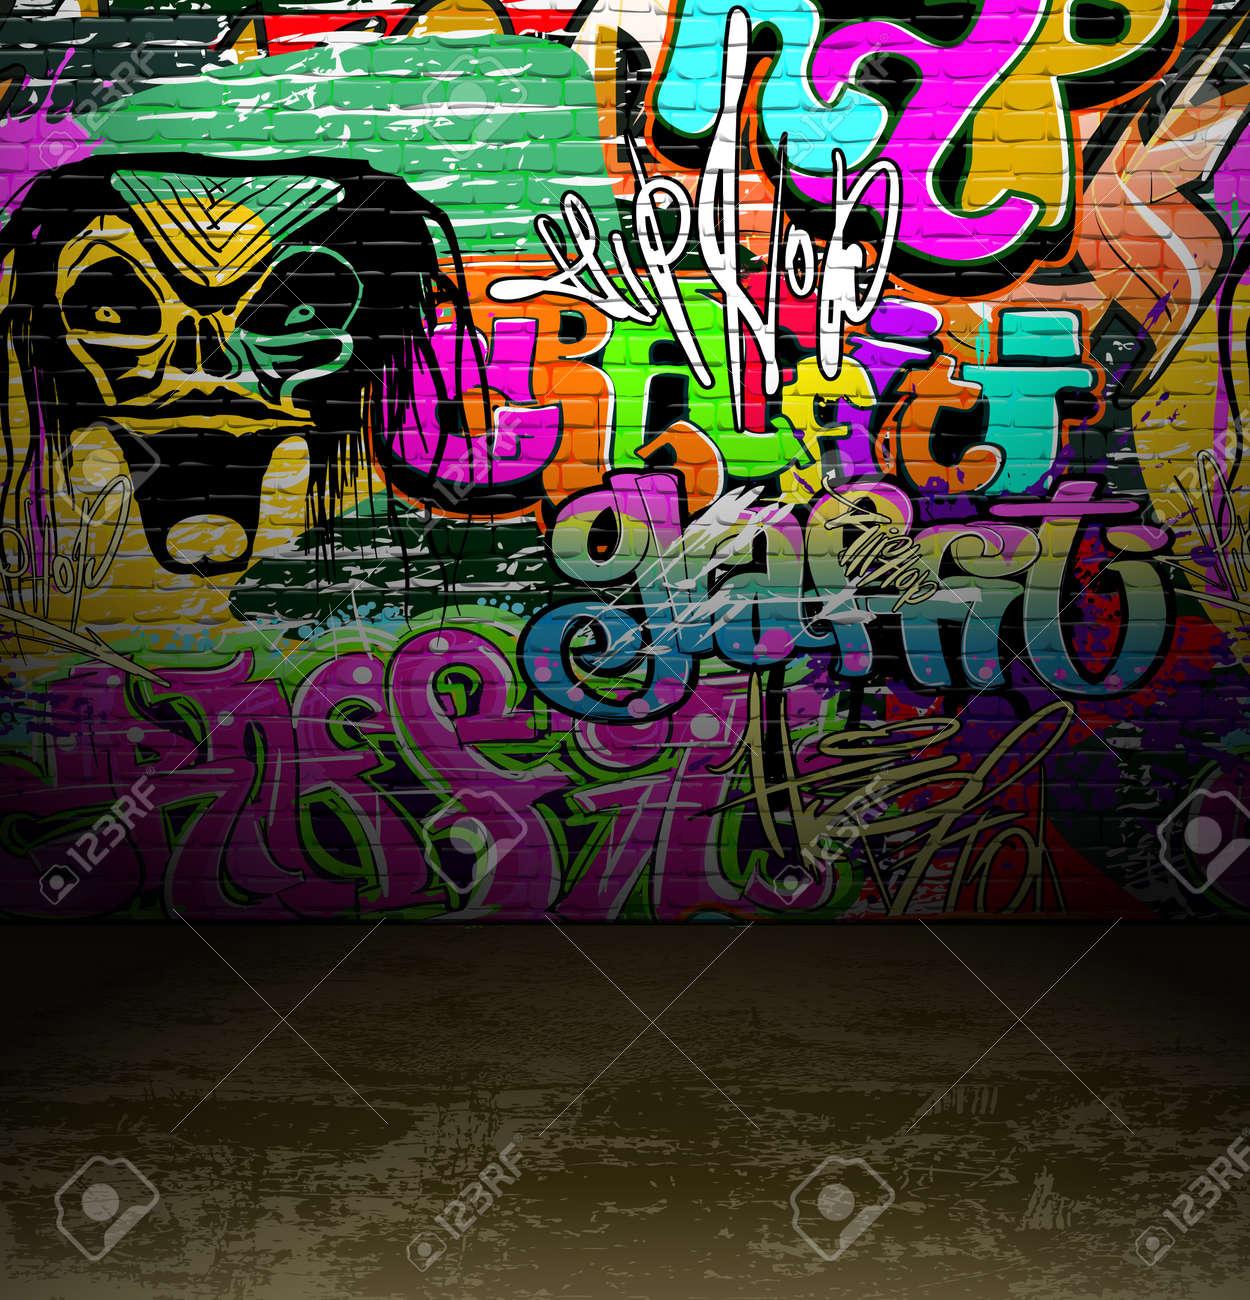 Graffiti wall vector free - Graffiti Wall Background Urban Street Grunge Art Vector Design Stock Vector 12486242